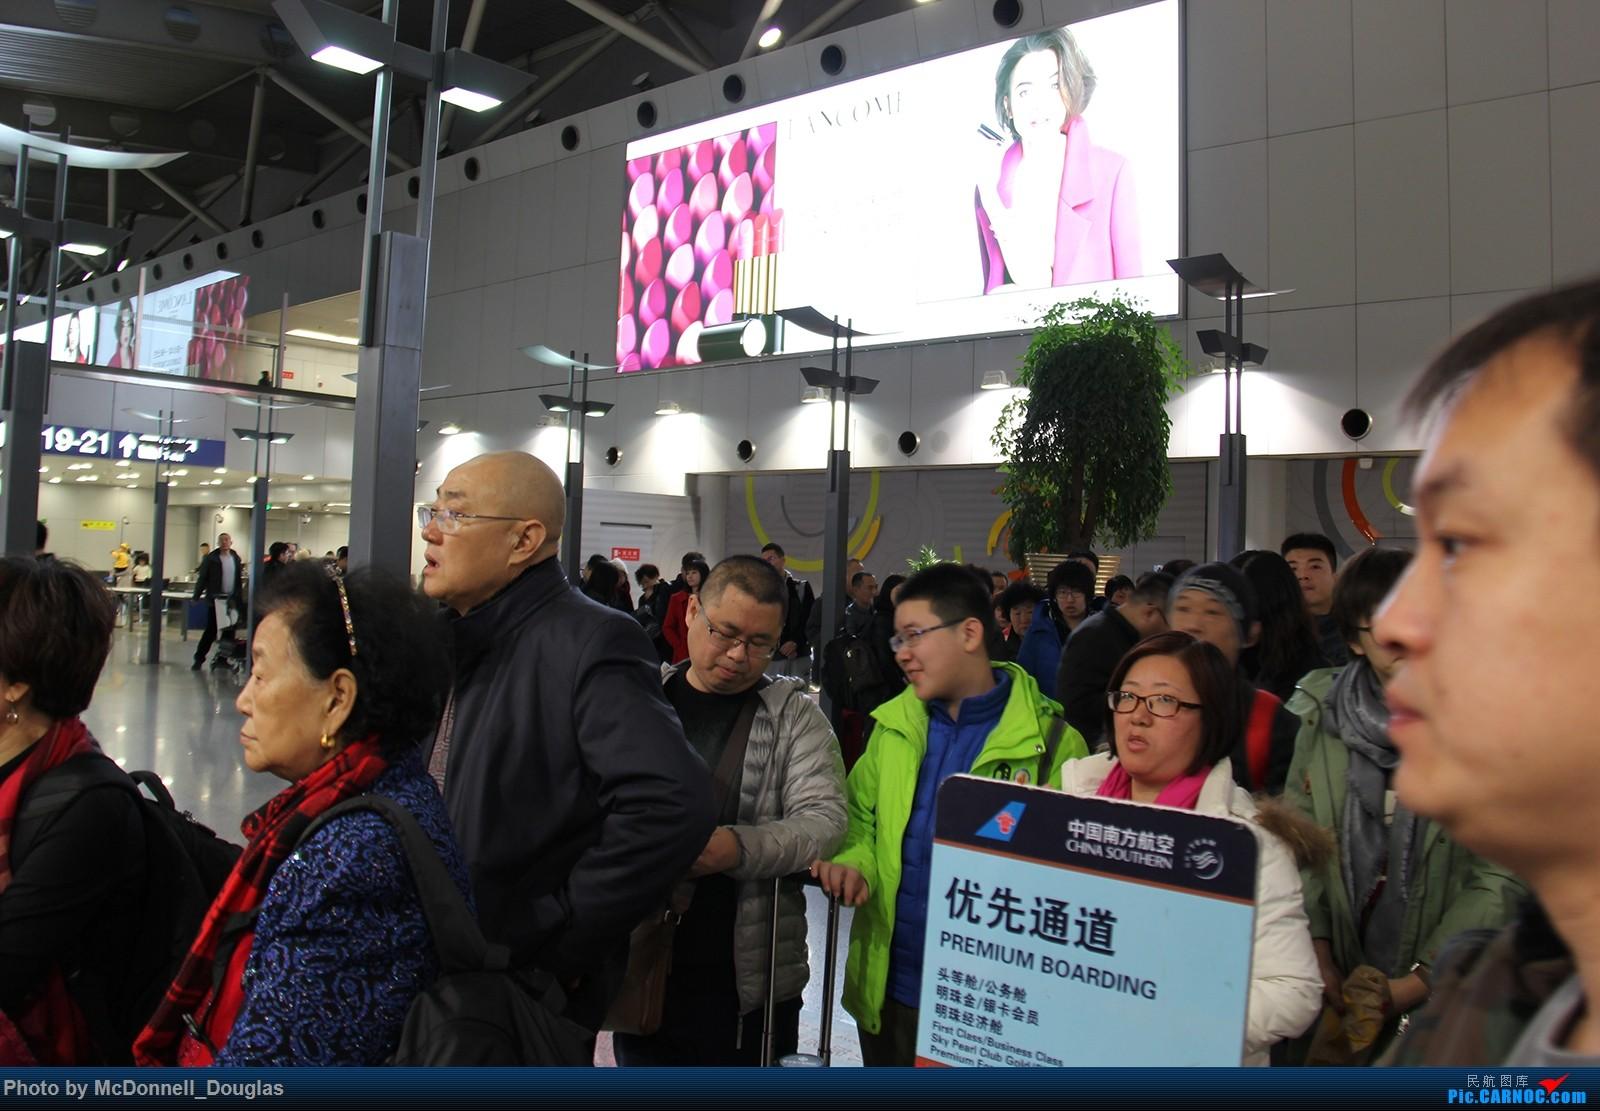 Re:[原创]【上海飞友会】【zc带你游天下(4)】不远千里飞跃喜马拉雅去看你,探寻高山另一边的神秘国度,和一群贫穷却快乐着的人们    中国北京首都国际机场